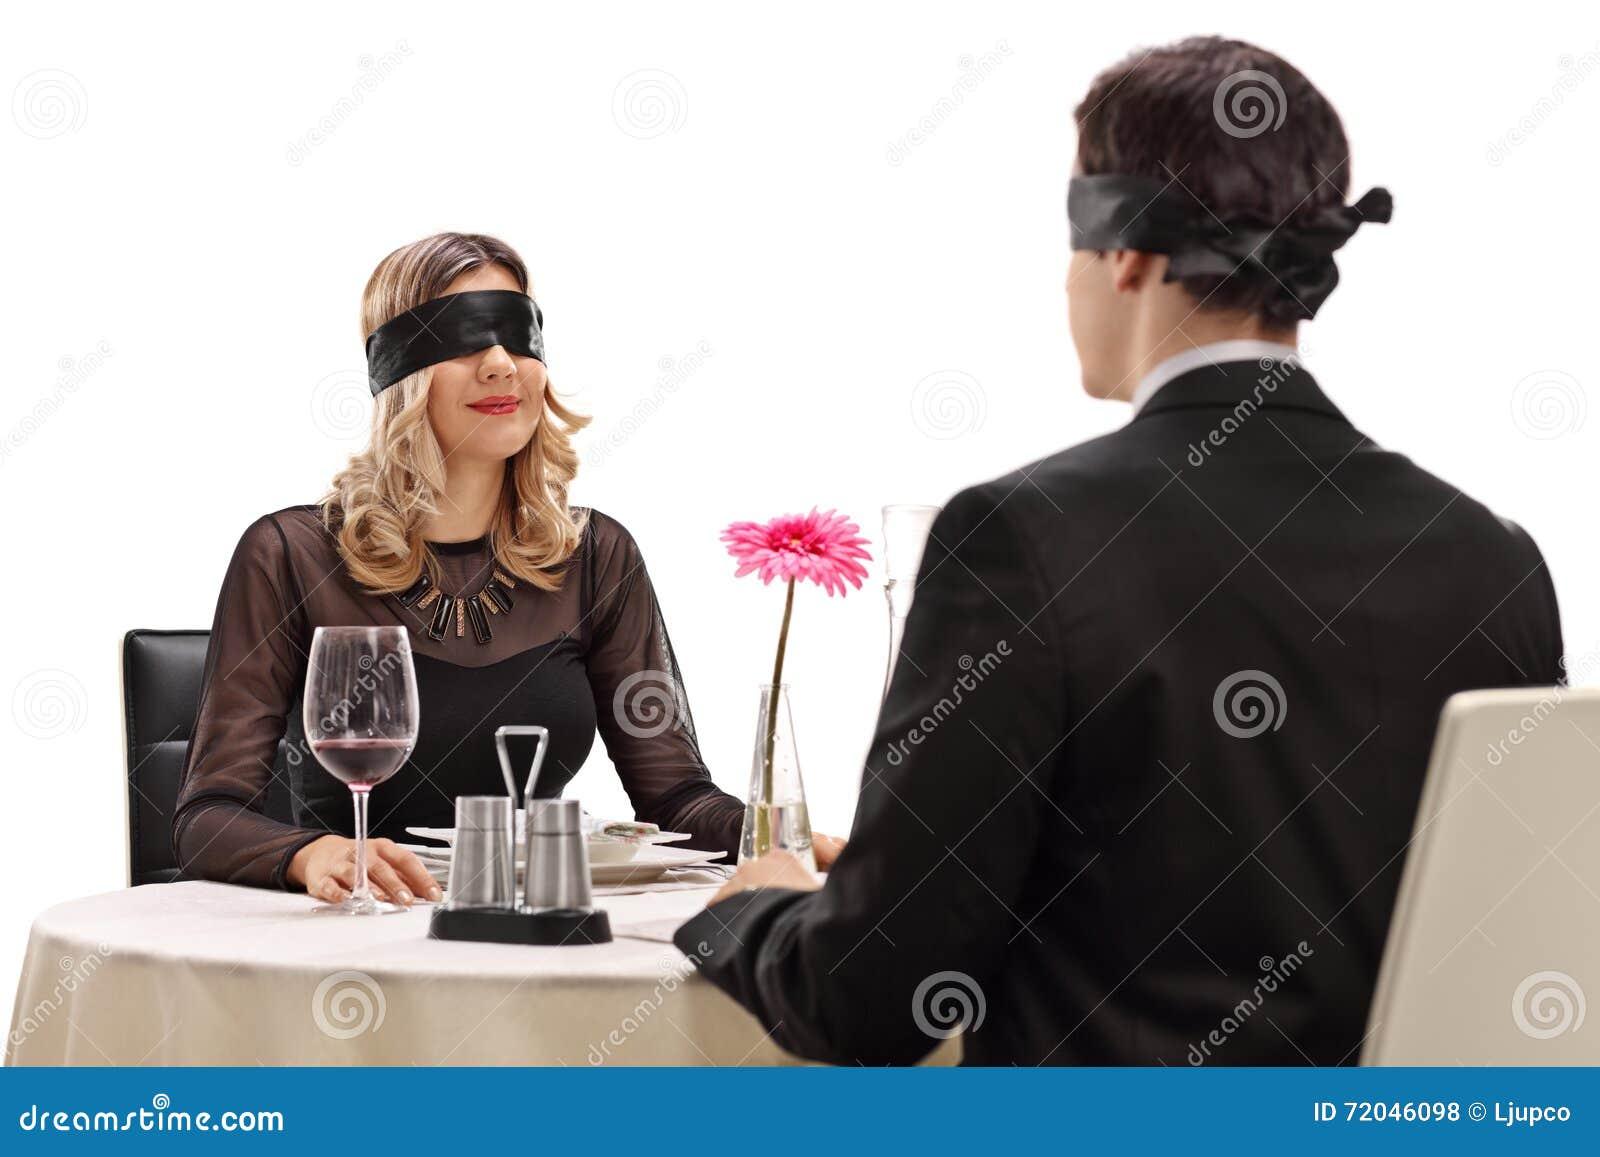 Local dating thessaloniki